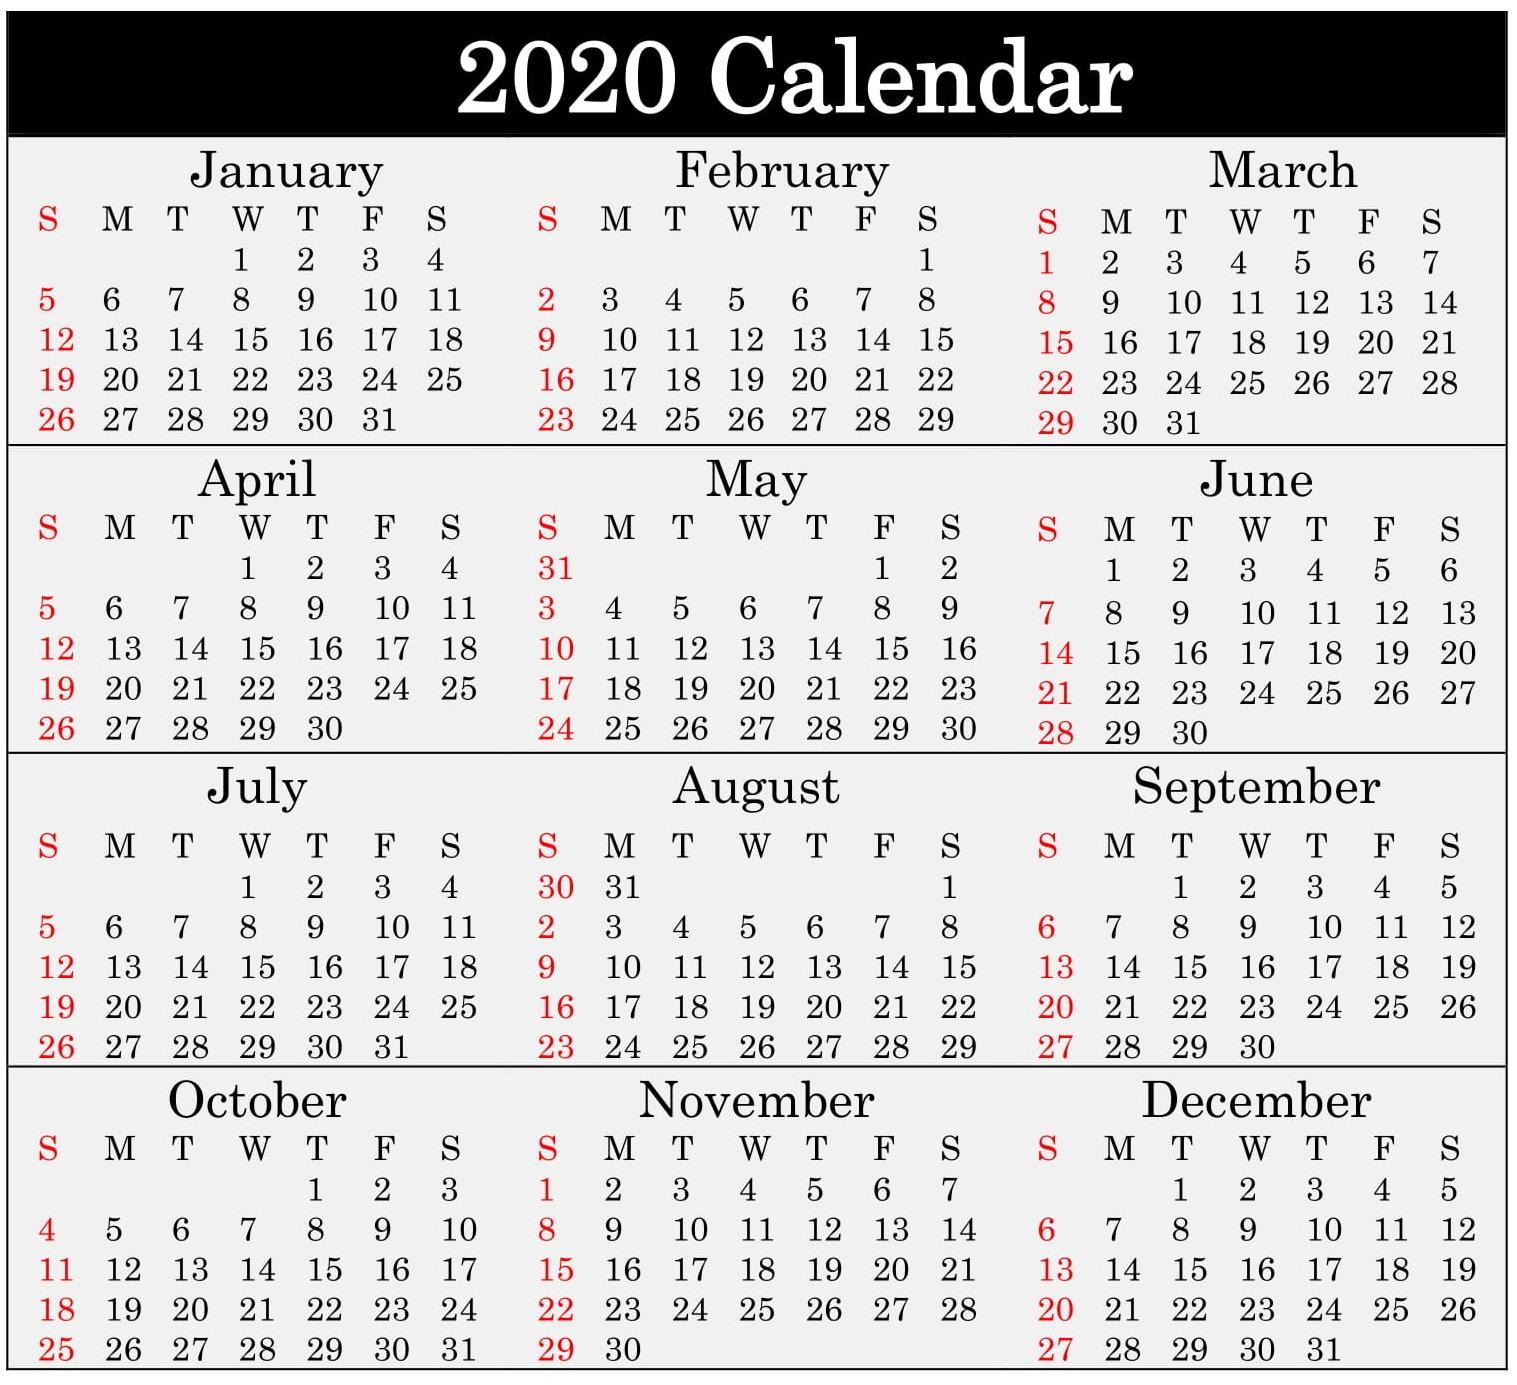 Free Printable 2020 Calendar Word Pdf Excel Document